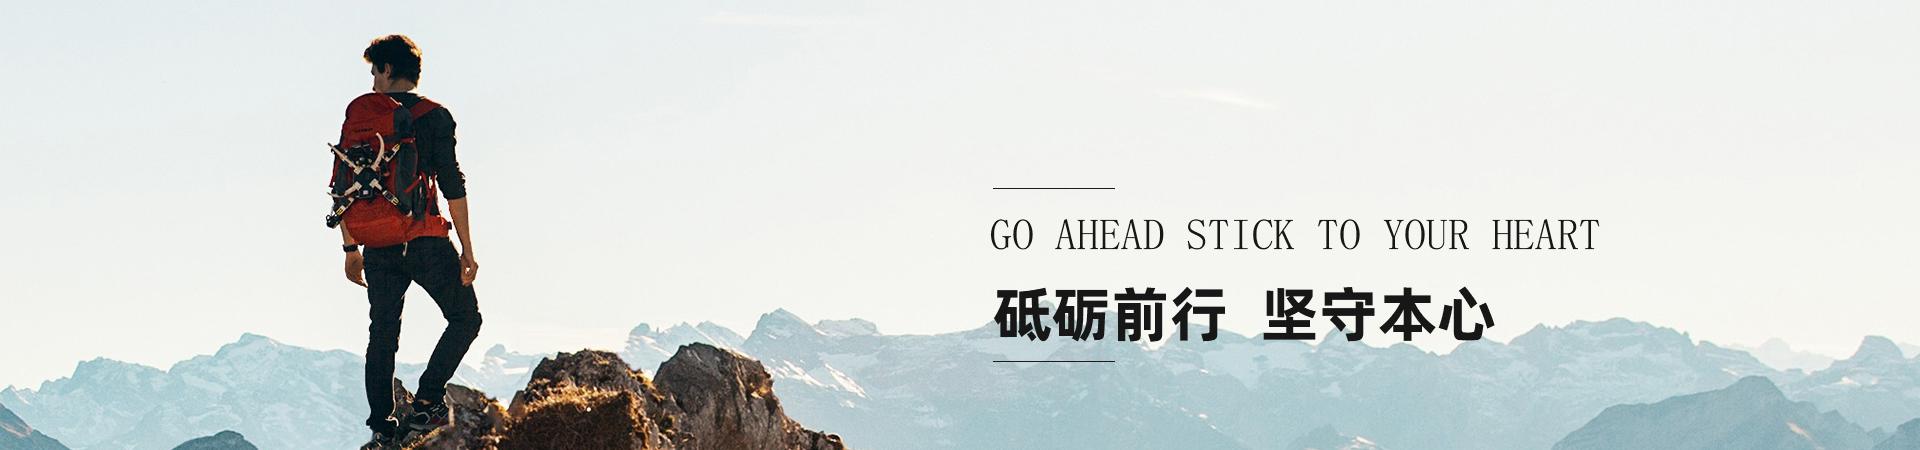 http://www.dzjirun.com/data/upload/202007/20200725085721_708.jpg